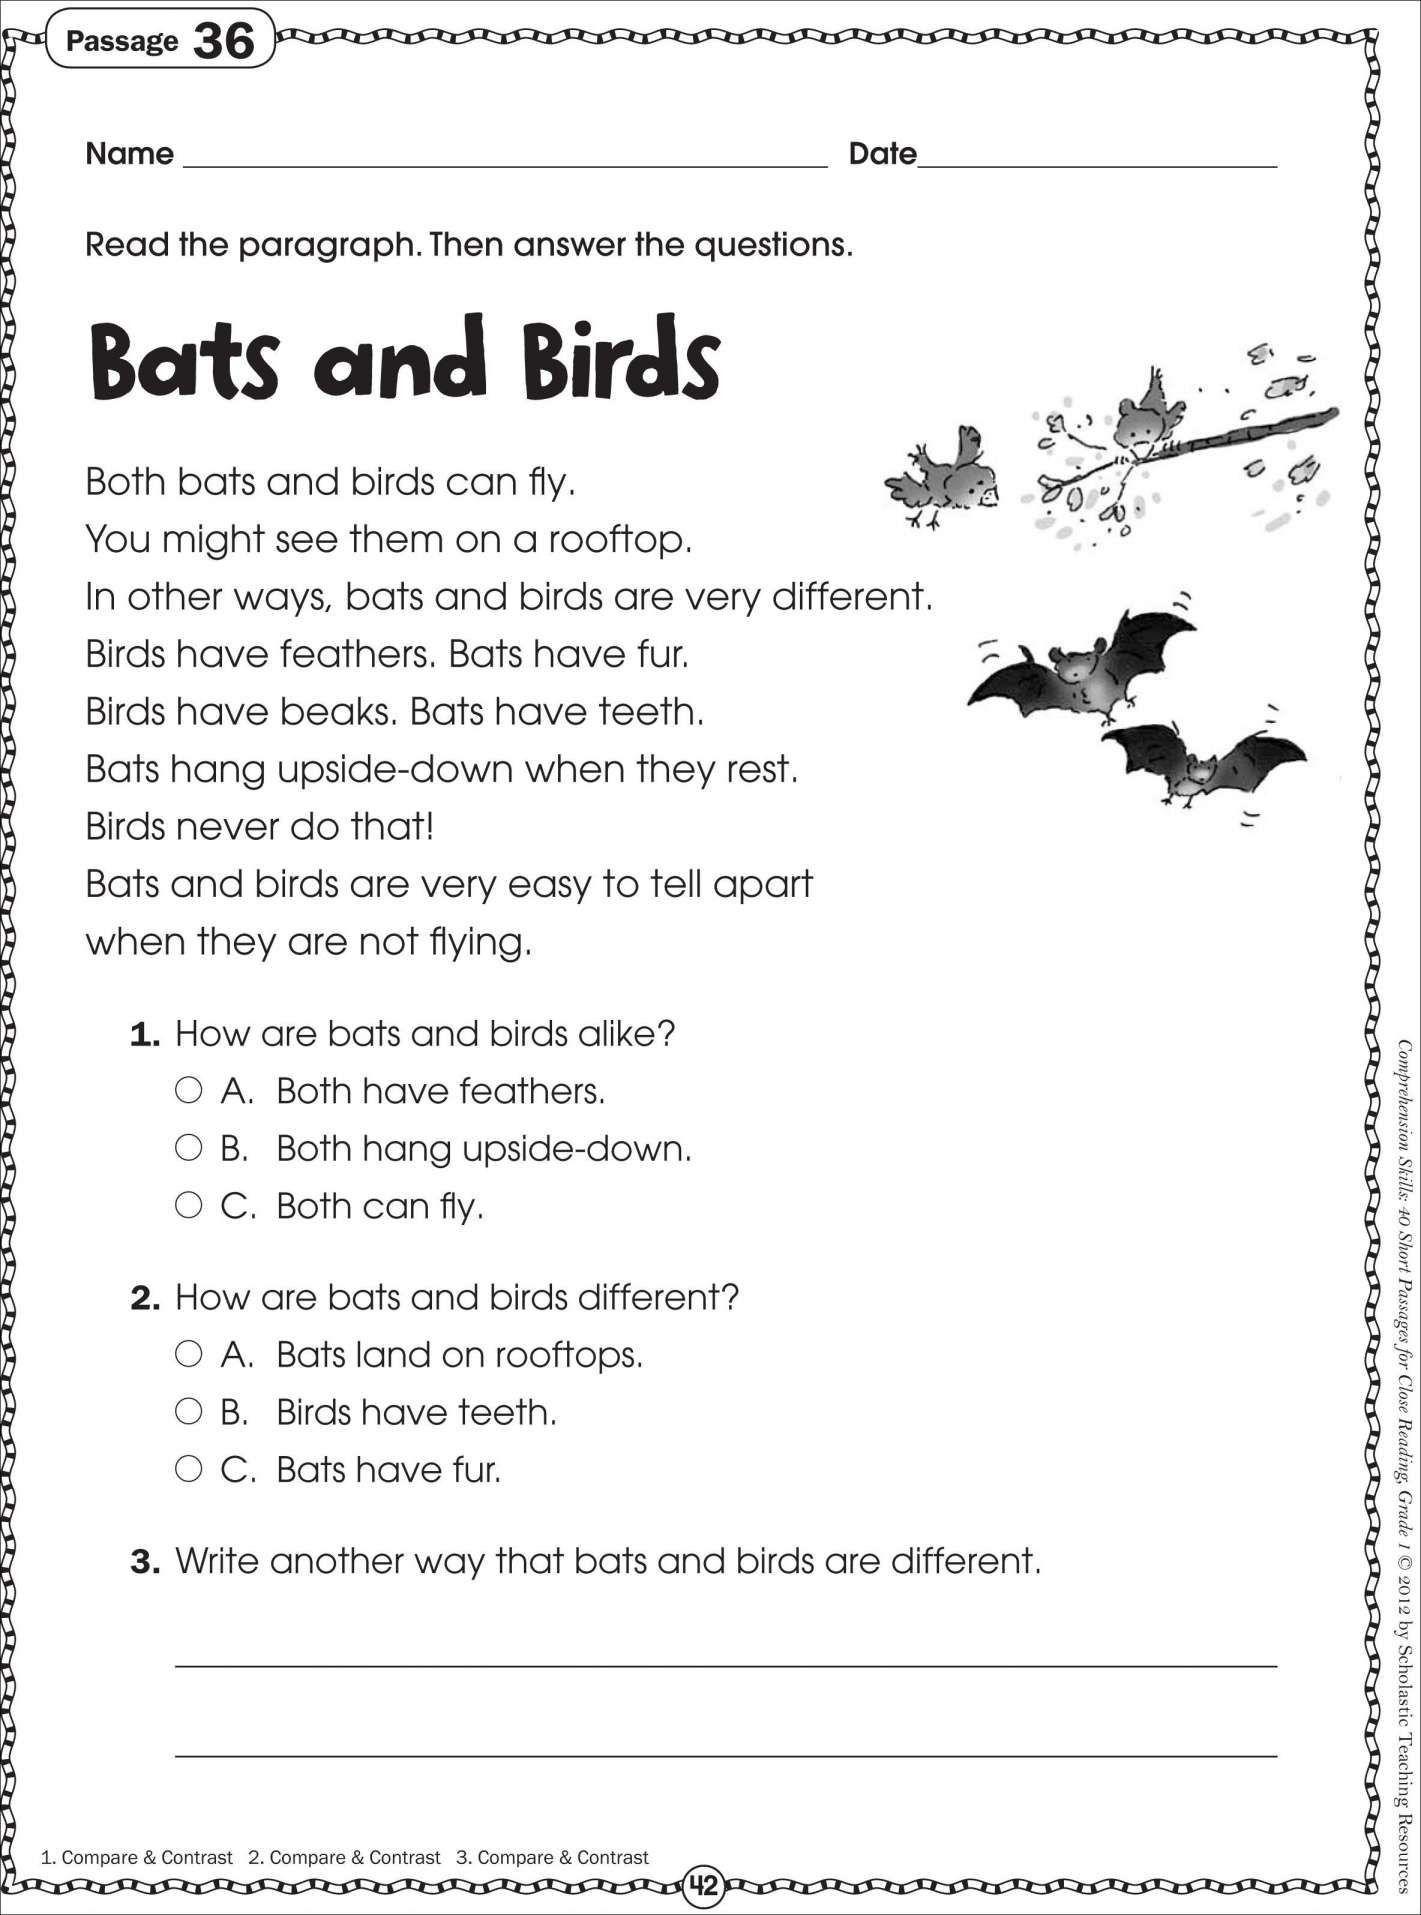 Reading Worksheets 5th Grade Reading Prehension Worksheets 5th Grade  Multiple Choic…   Reading worksheets [ 1915 x 1421 Pixel ]